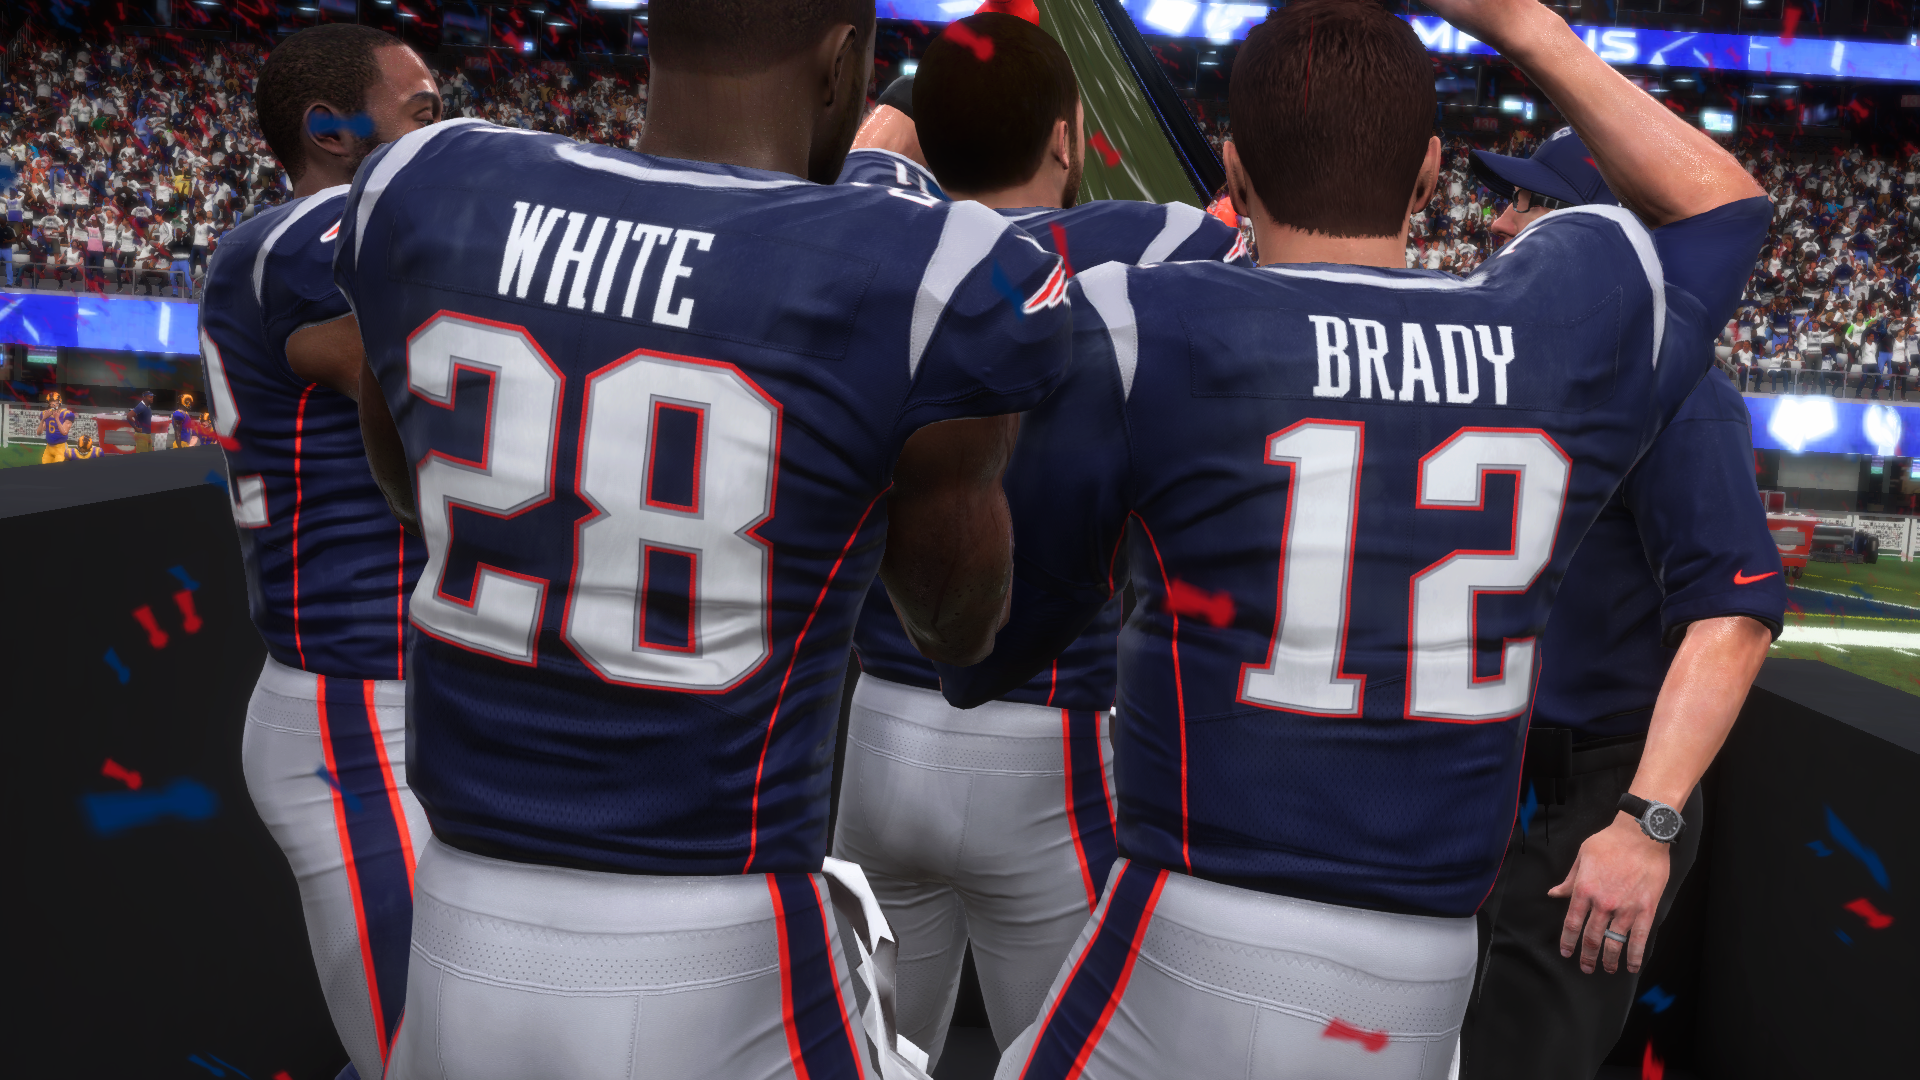 Patriots win in madden 19